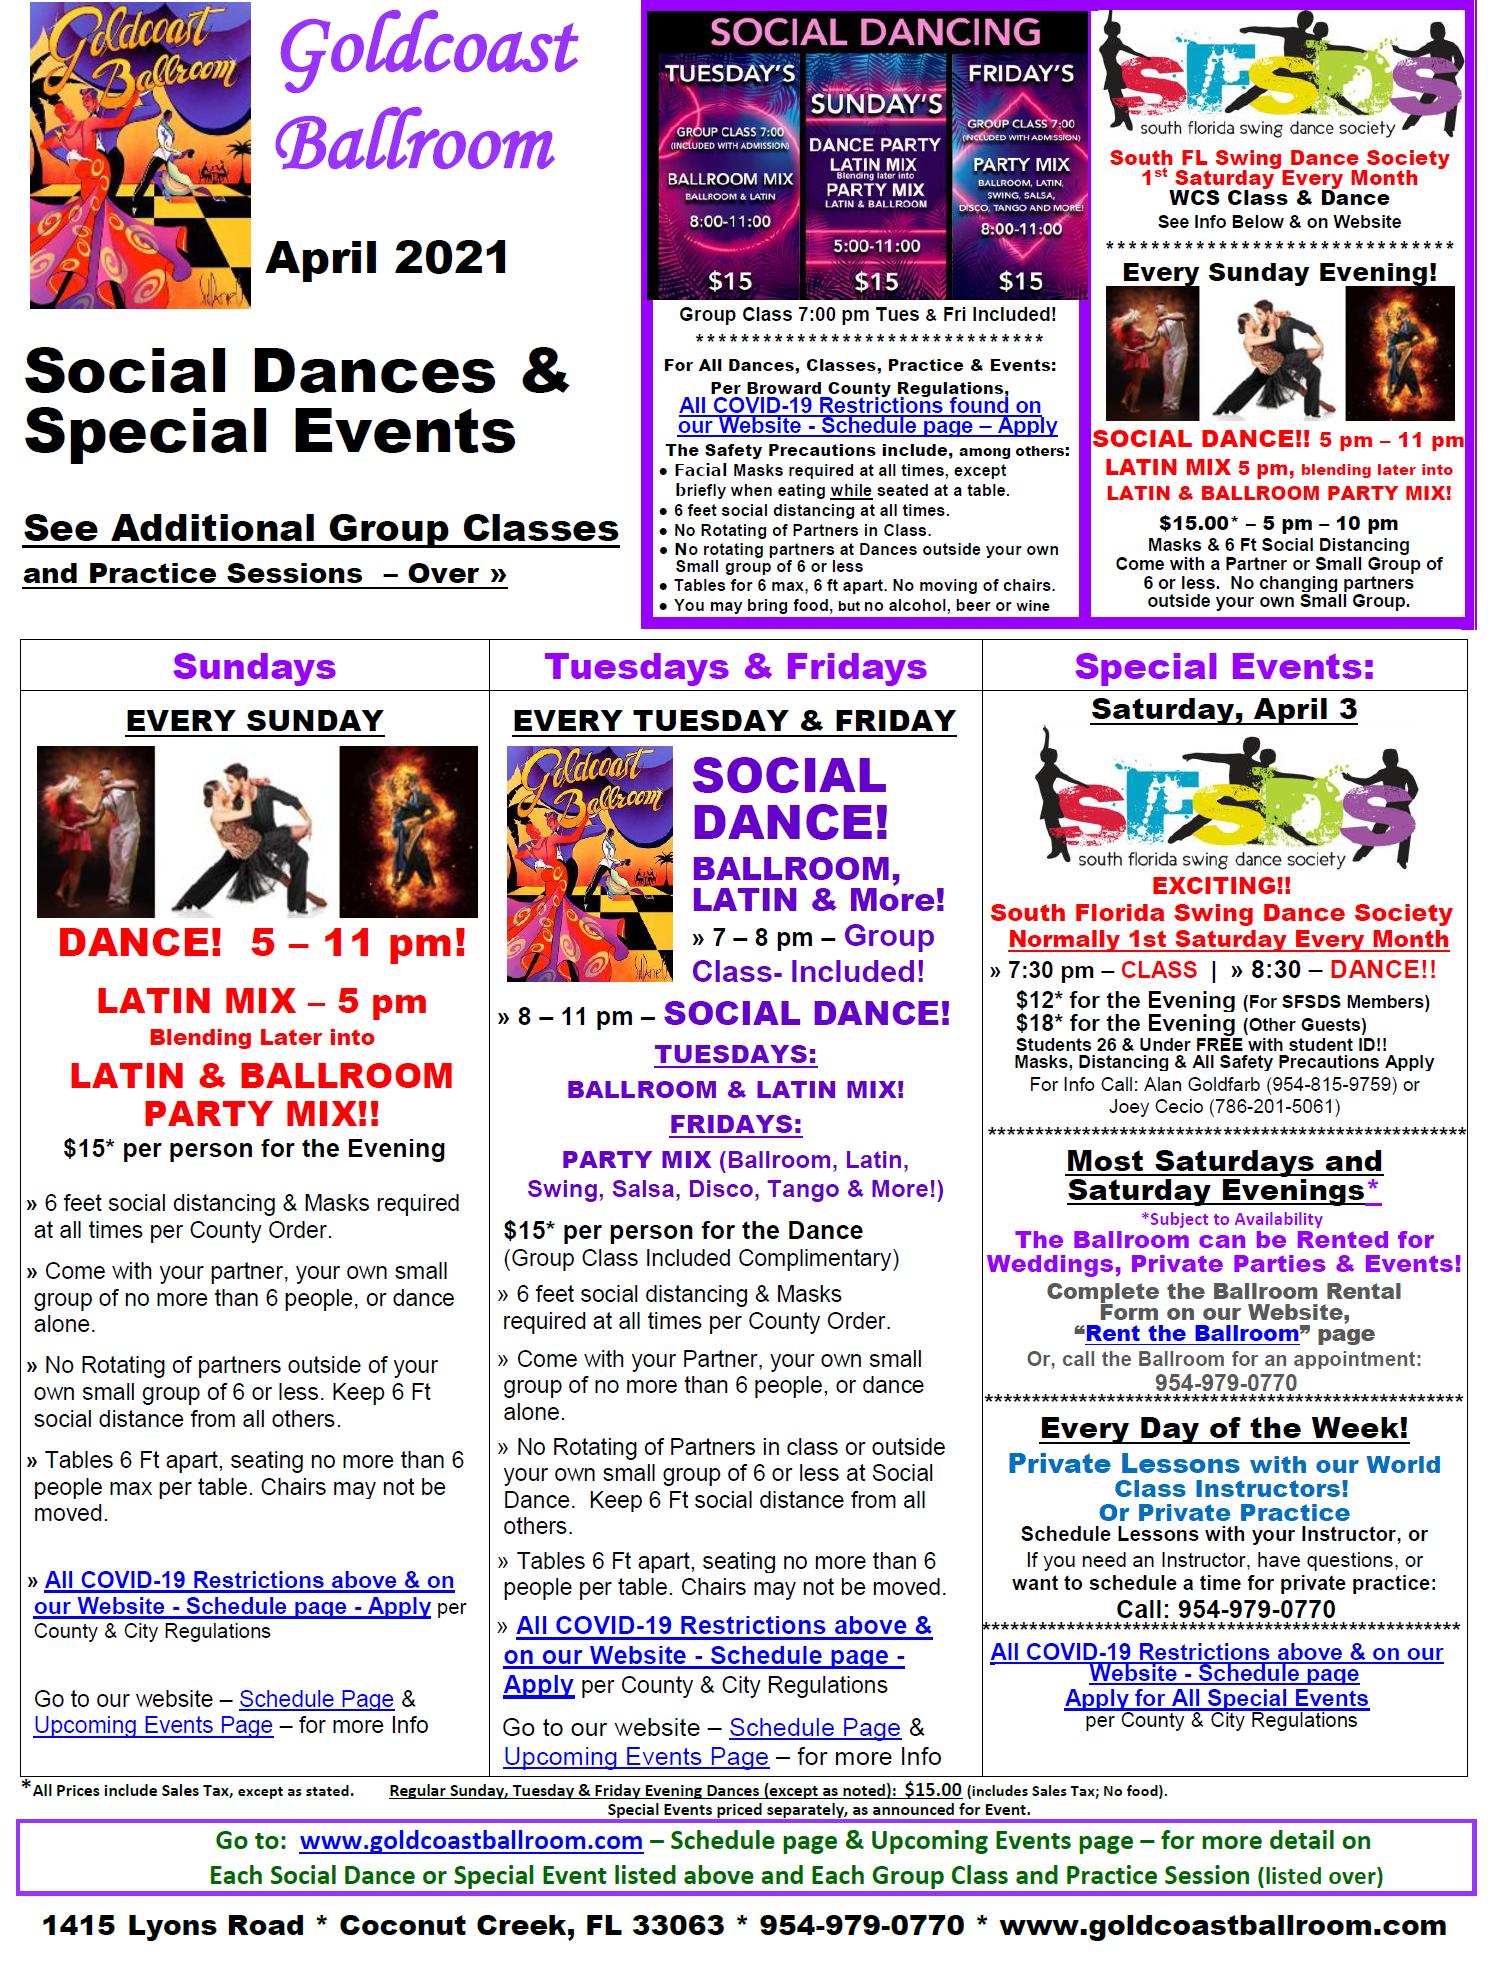 Goldcoast Ballroom - April 2021 Calendar - Social Dances & Special Events